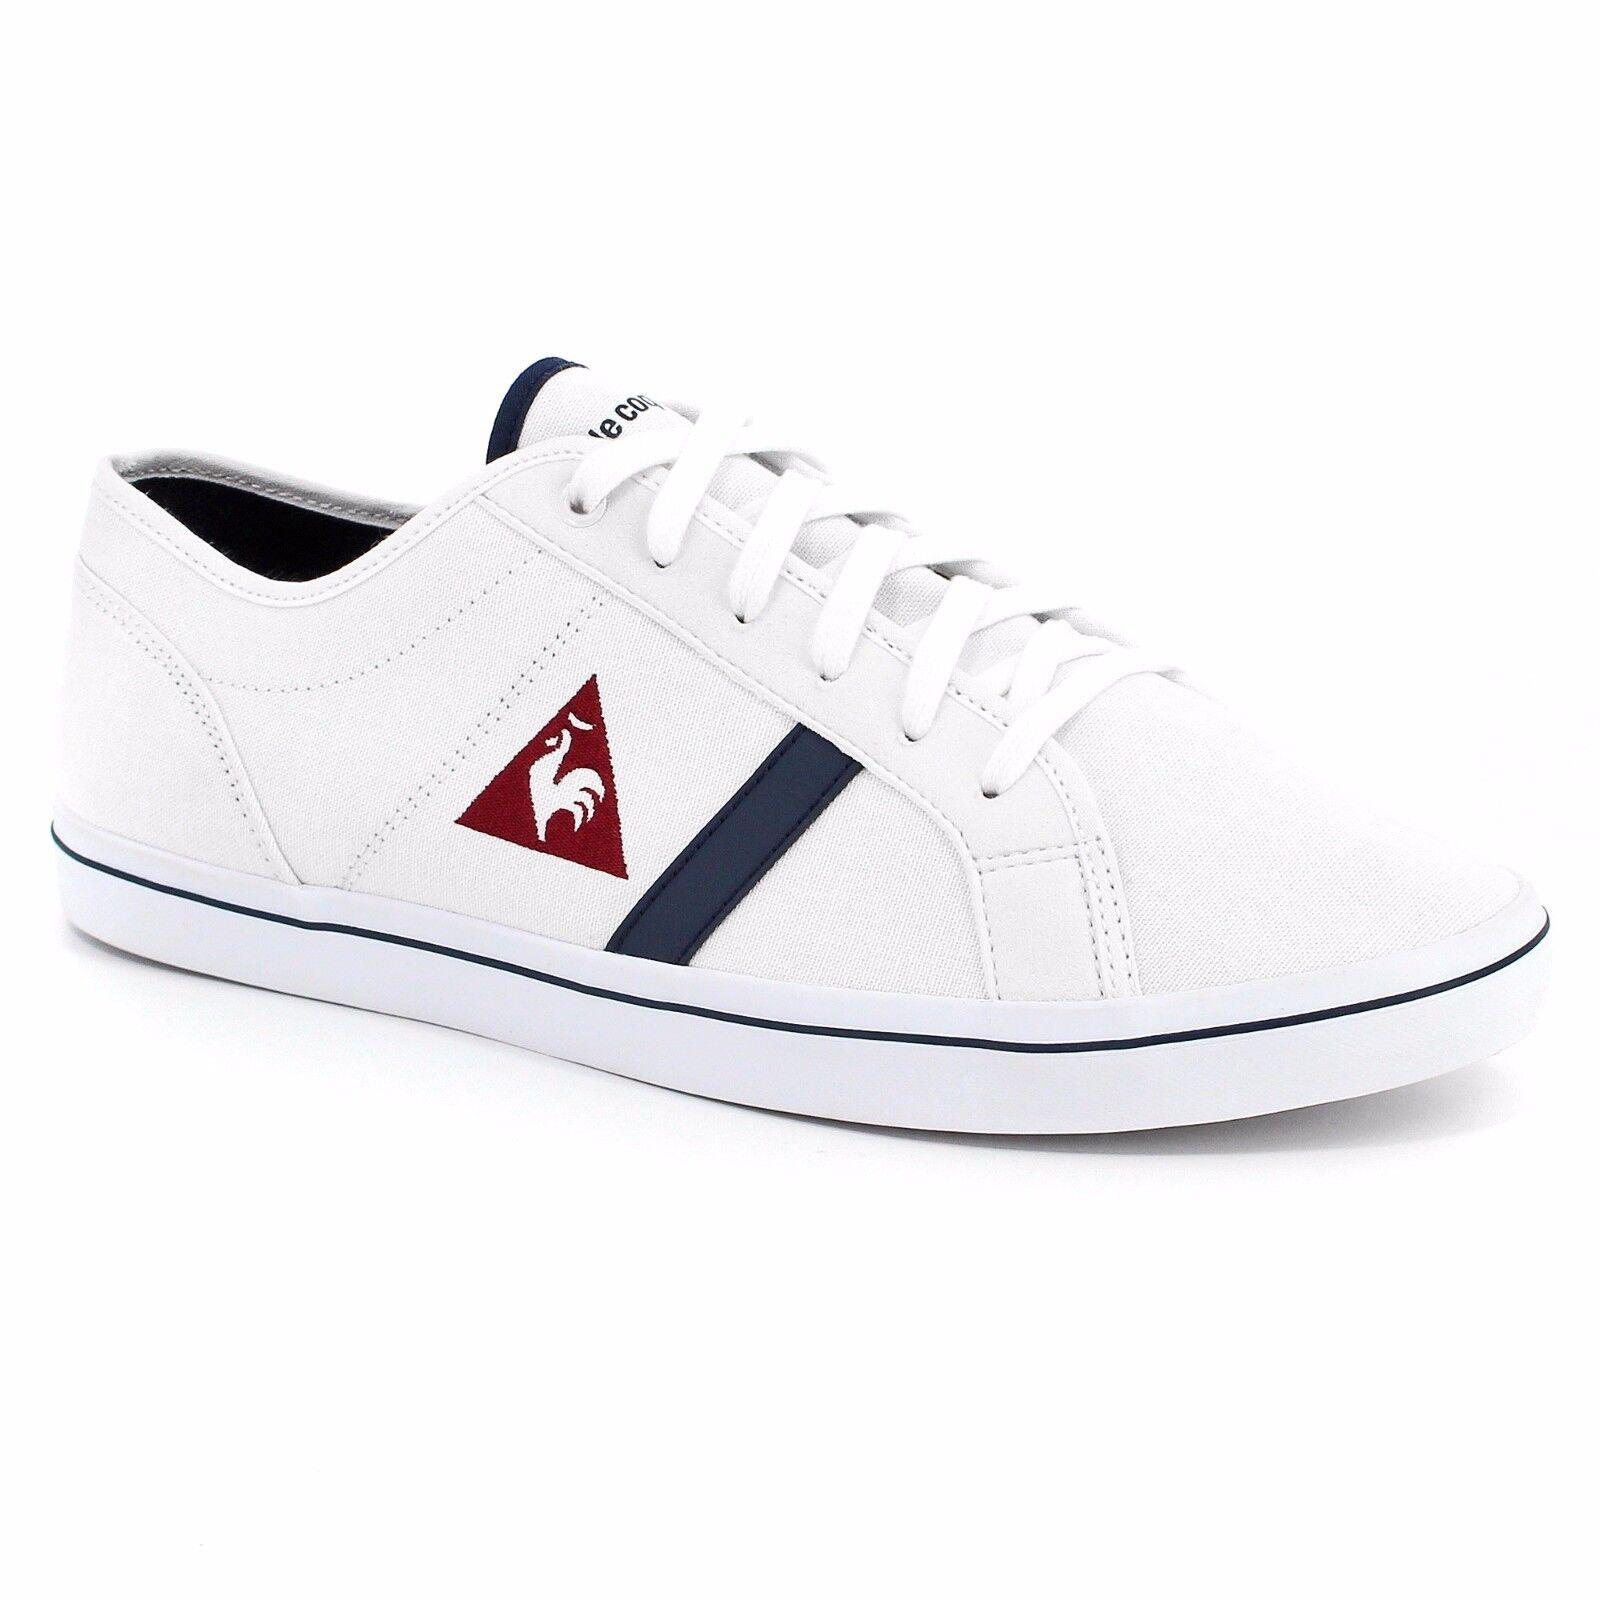 Scarpe casual da uomo SCARPE LE COQ SPORTIF ACEONE CVS sneakers bianco in tela 1620152